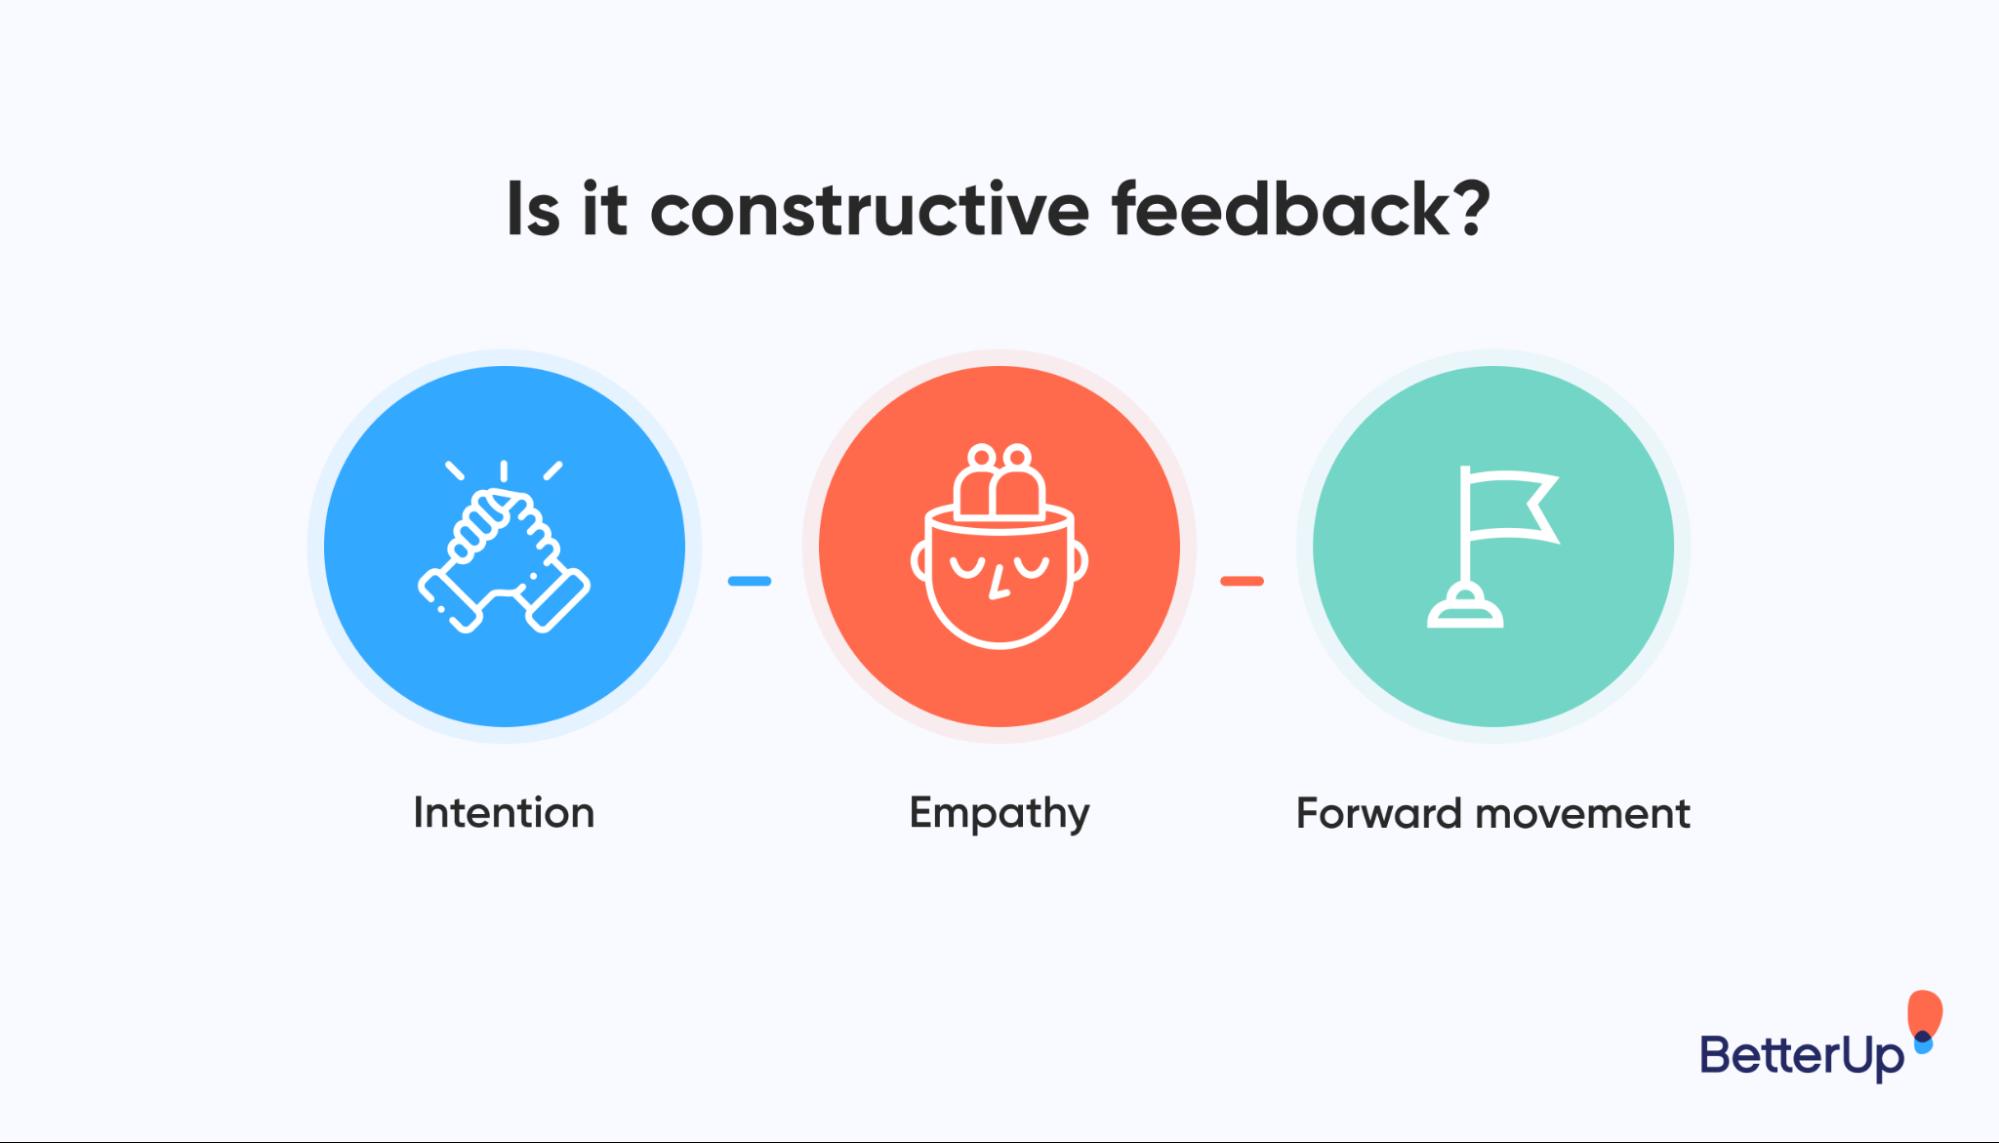 constructive-feedback-how-to-receive-feedback